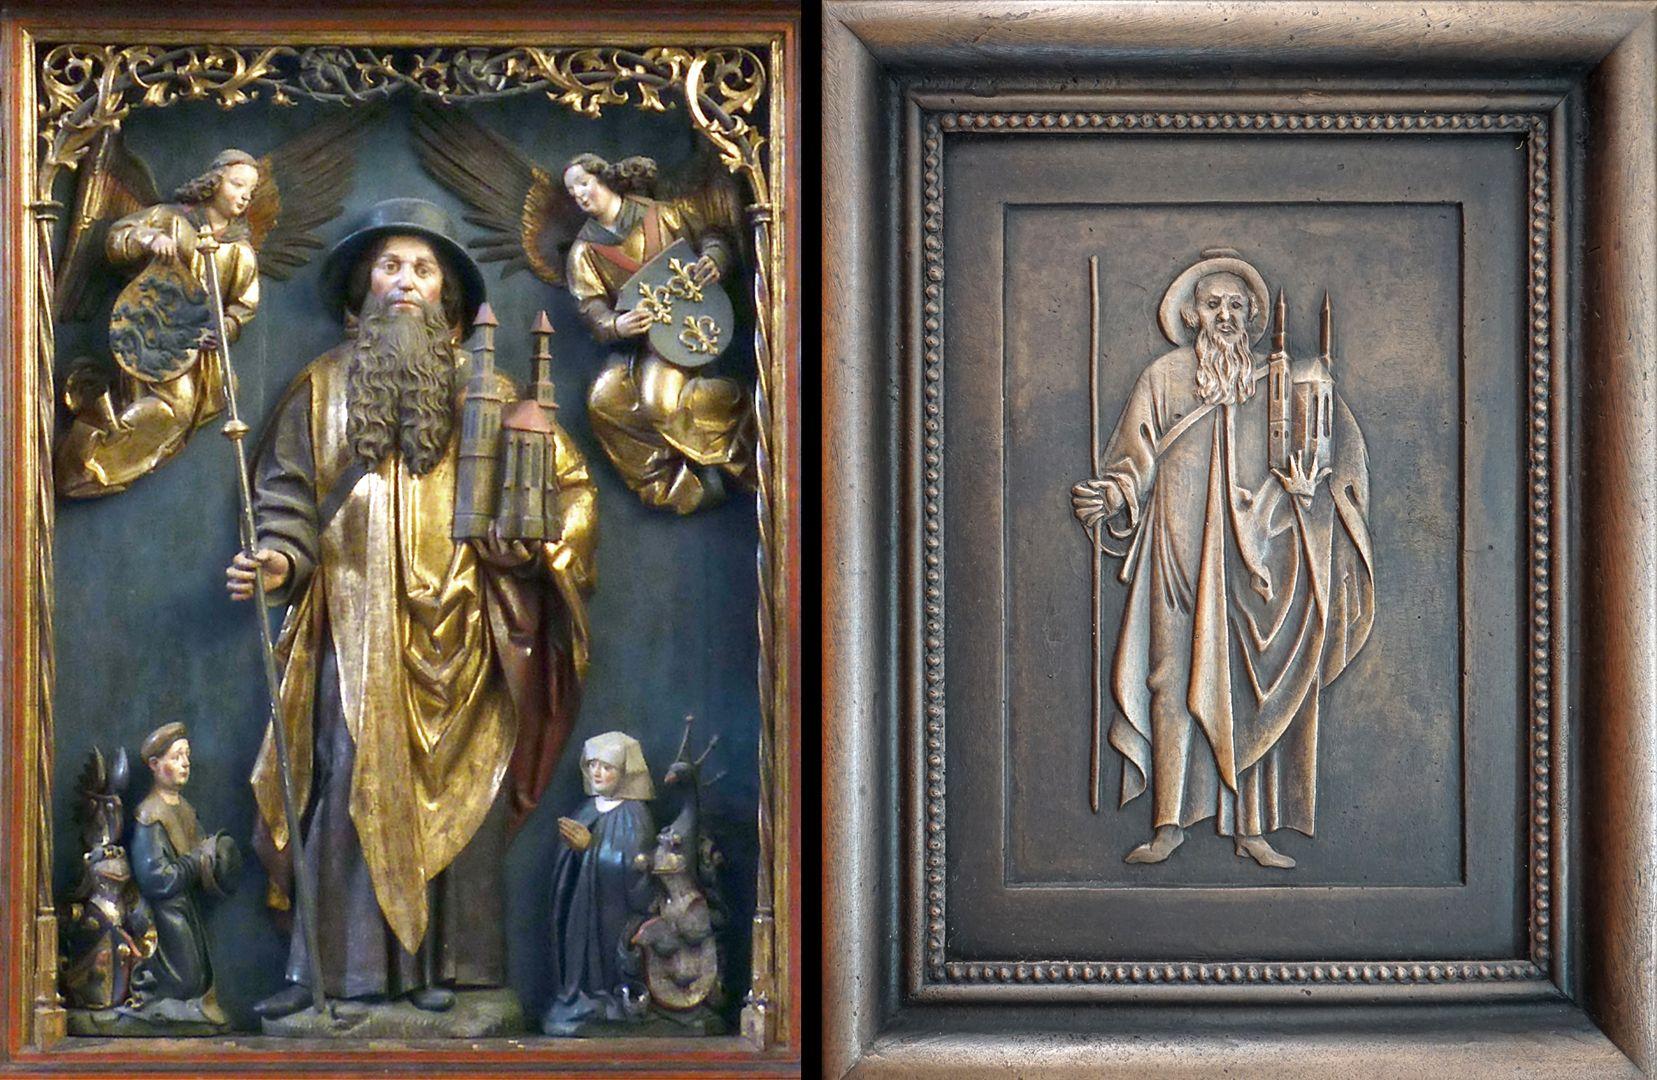 Paul Ritter Grabstätte links Sebaldus Altar in Schwäbisch Gmünd, rechts gerahmtes Detail auf dem Epitaph